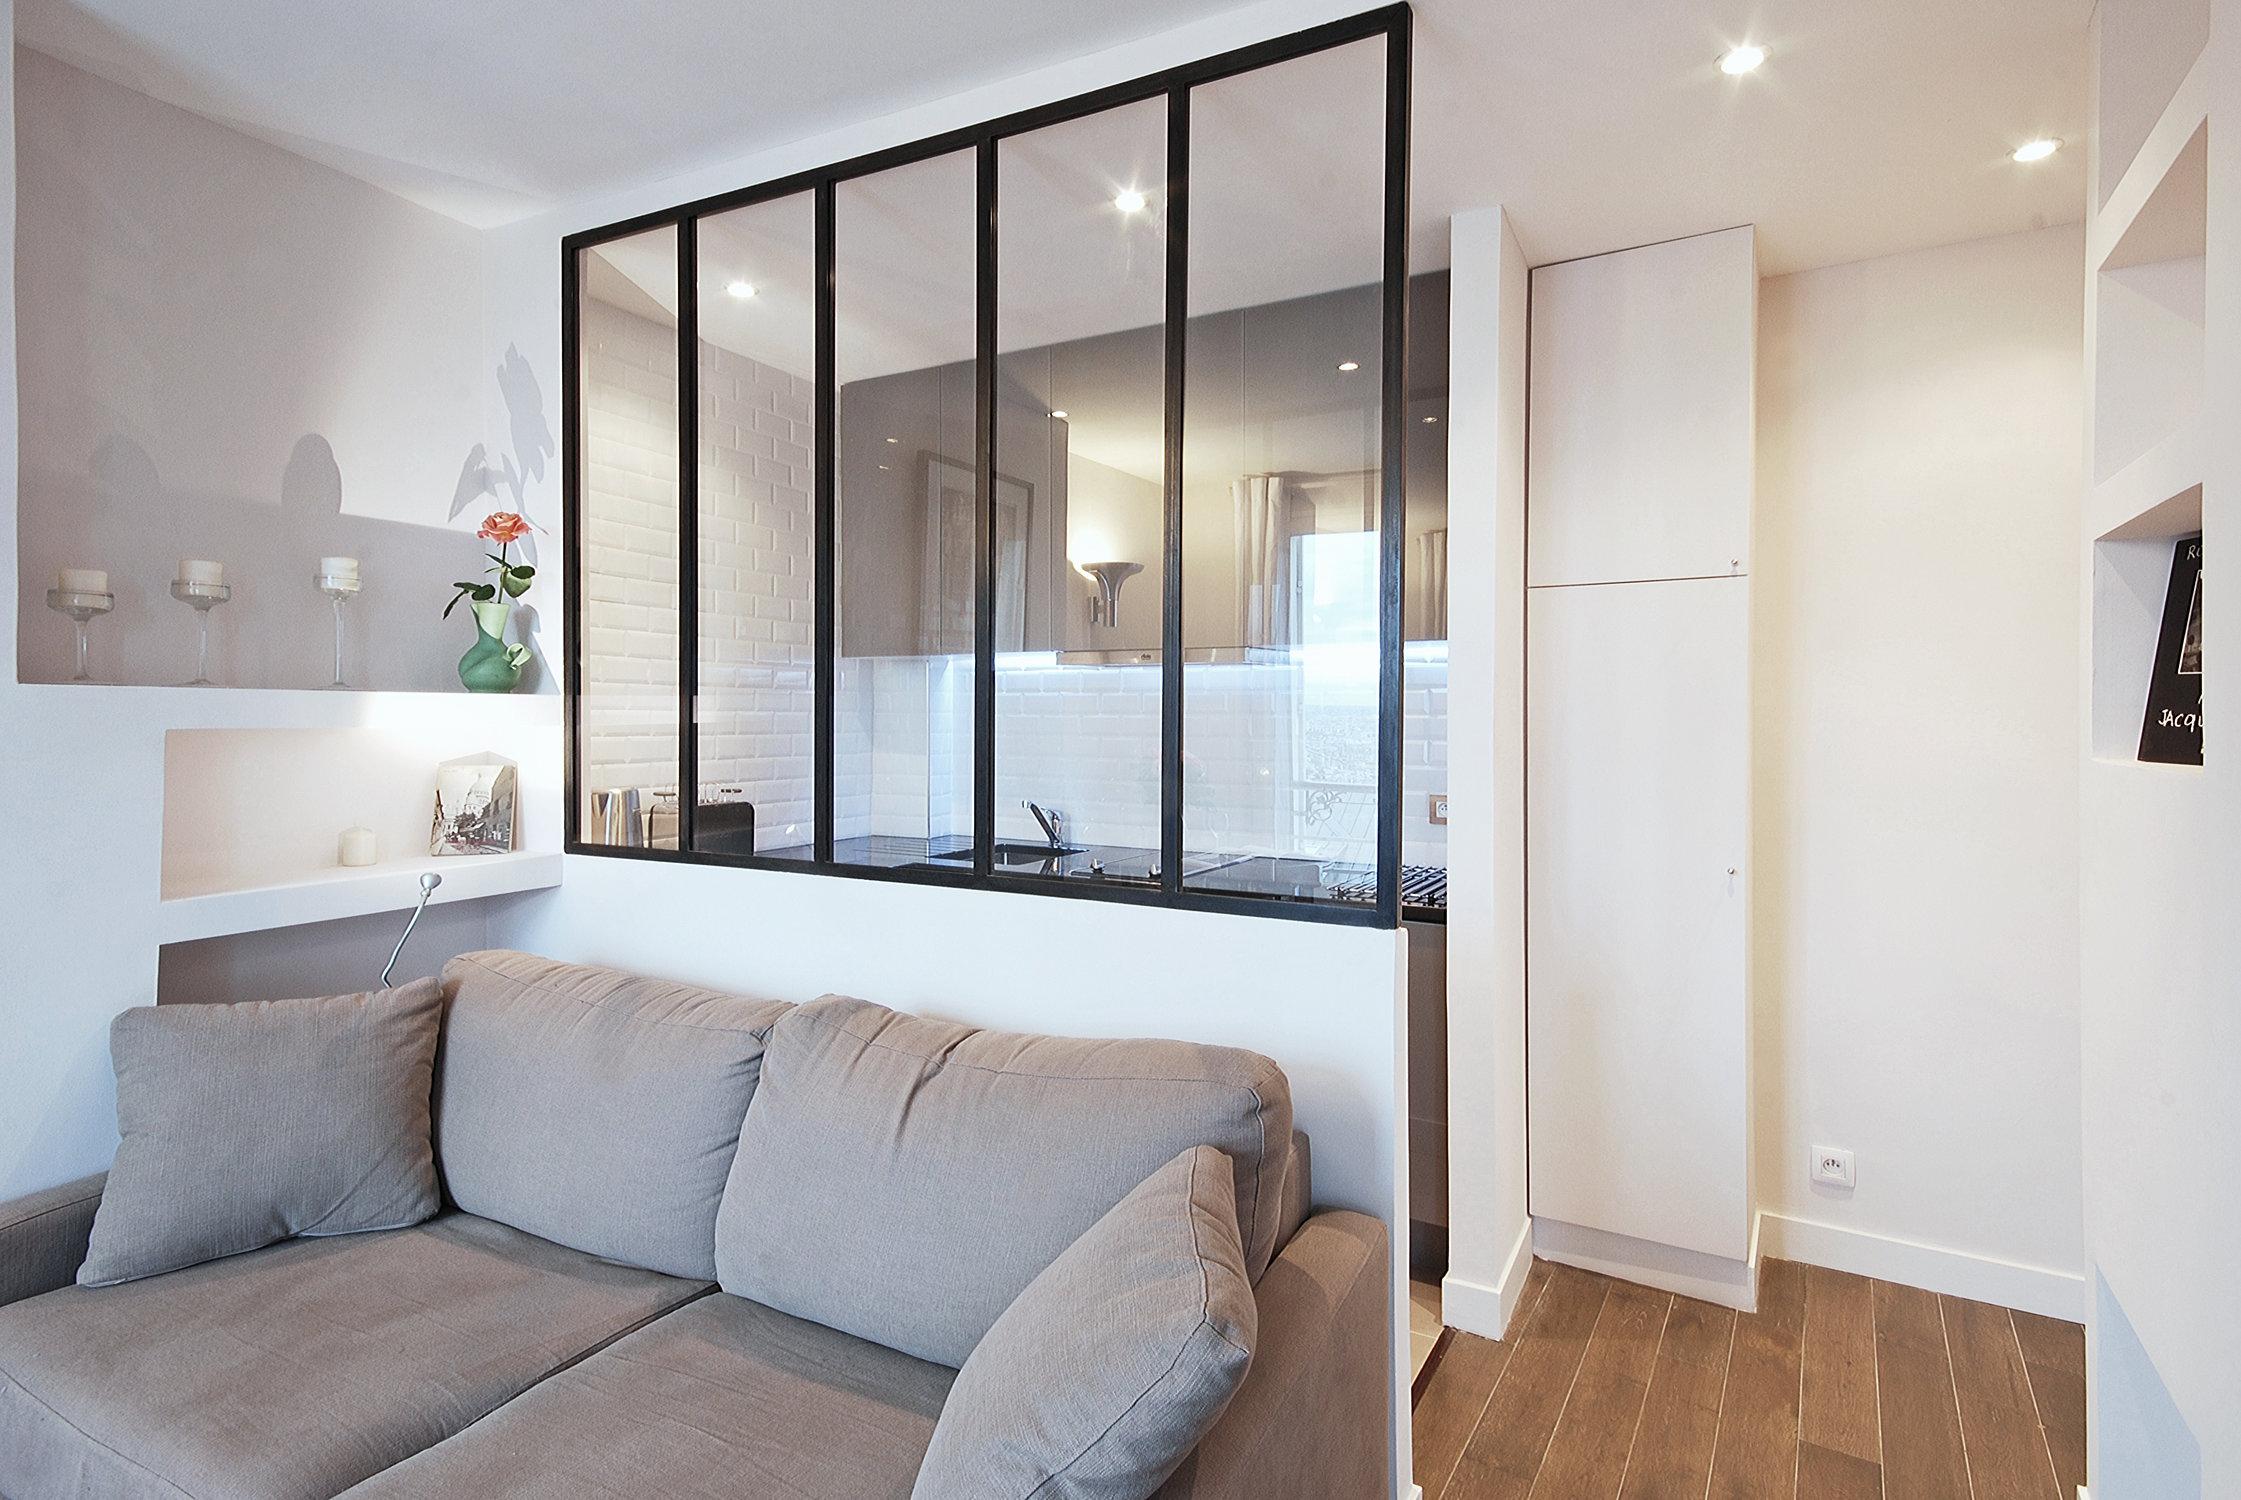 verriere accordeon verrire sur mesure avec porte verrire sur mesure with verriere accordeon. Black Bedroom Furniture Sets. Home Design Ideas